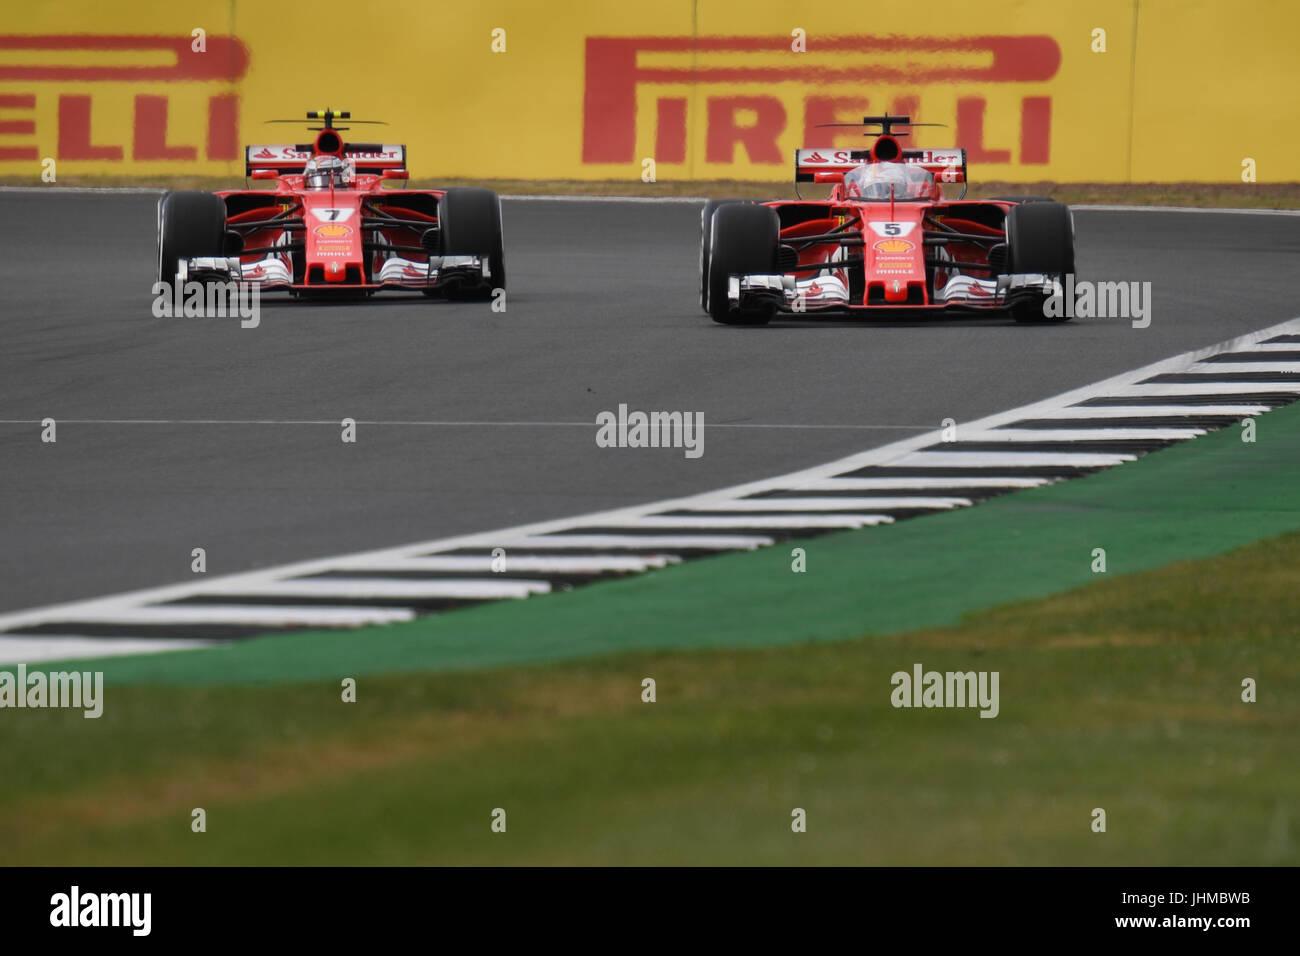 Silverstone Race Circuit, UK. Friday 14th July 2017. Sebastian Vettal's F1 Ferrari including a driver sheild - Stock Image